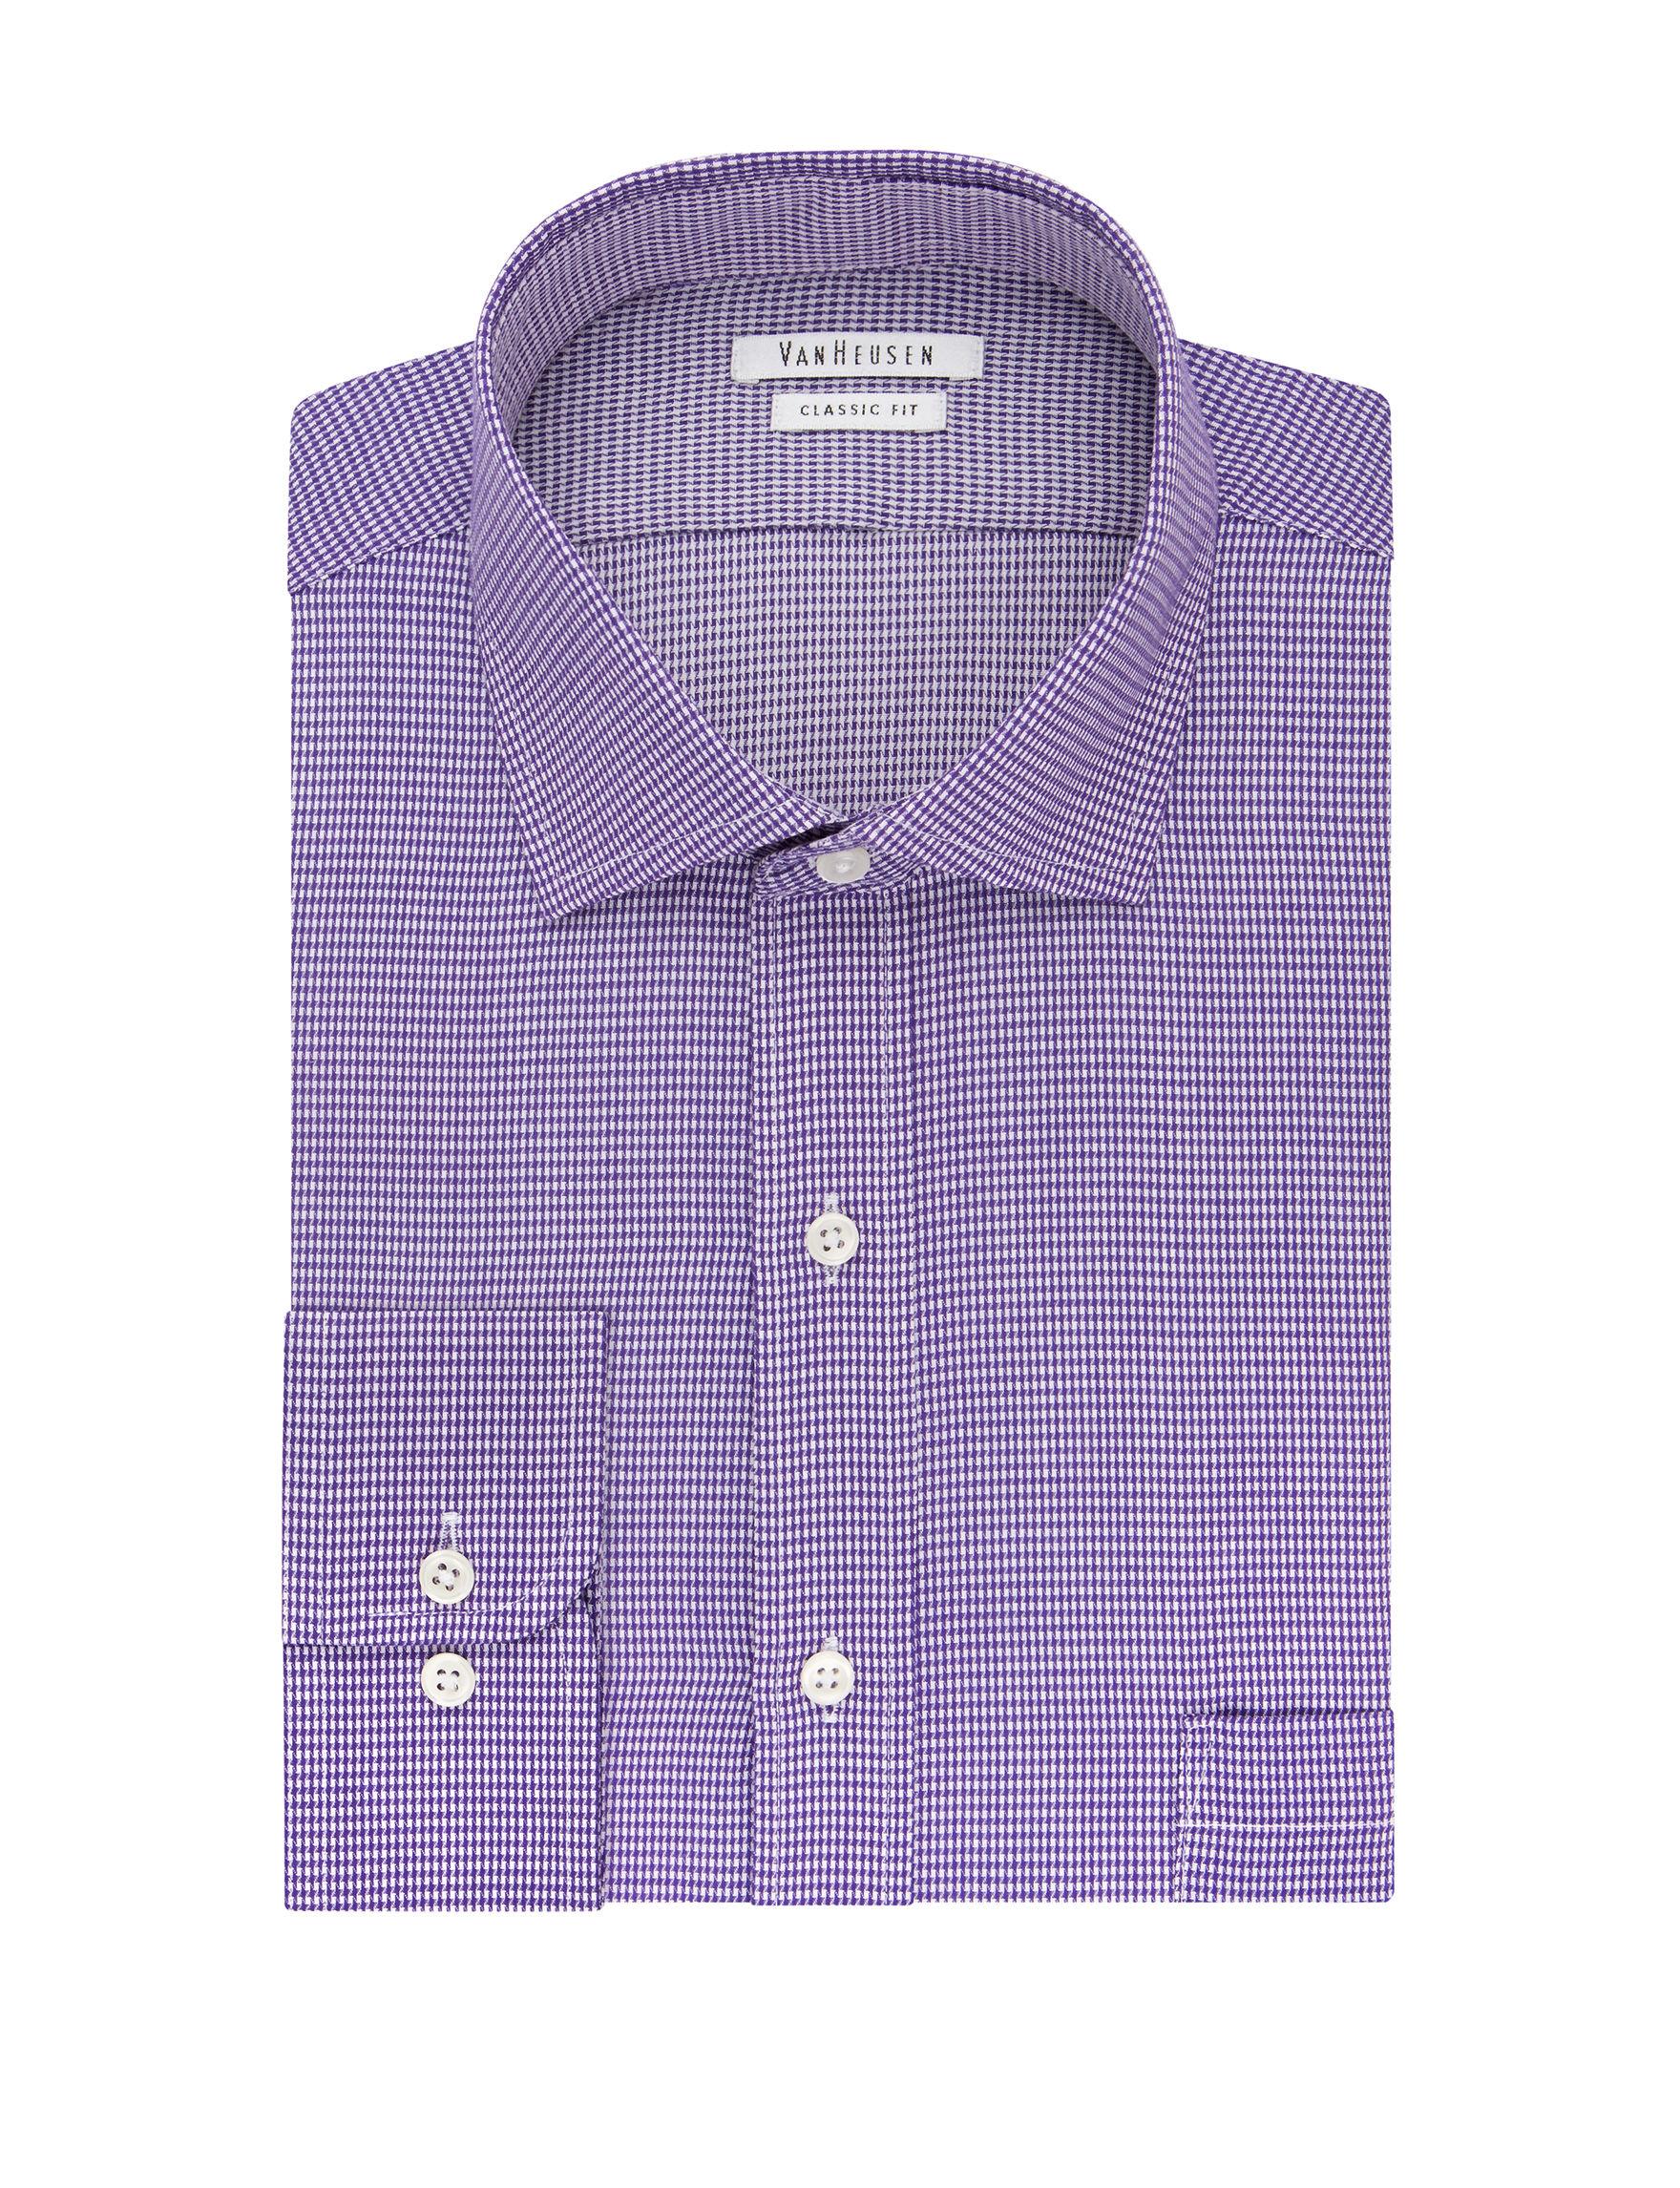 Van Heusen Lavender Dress Shirts